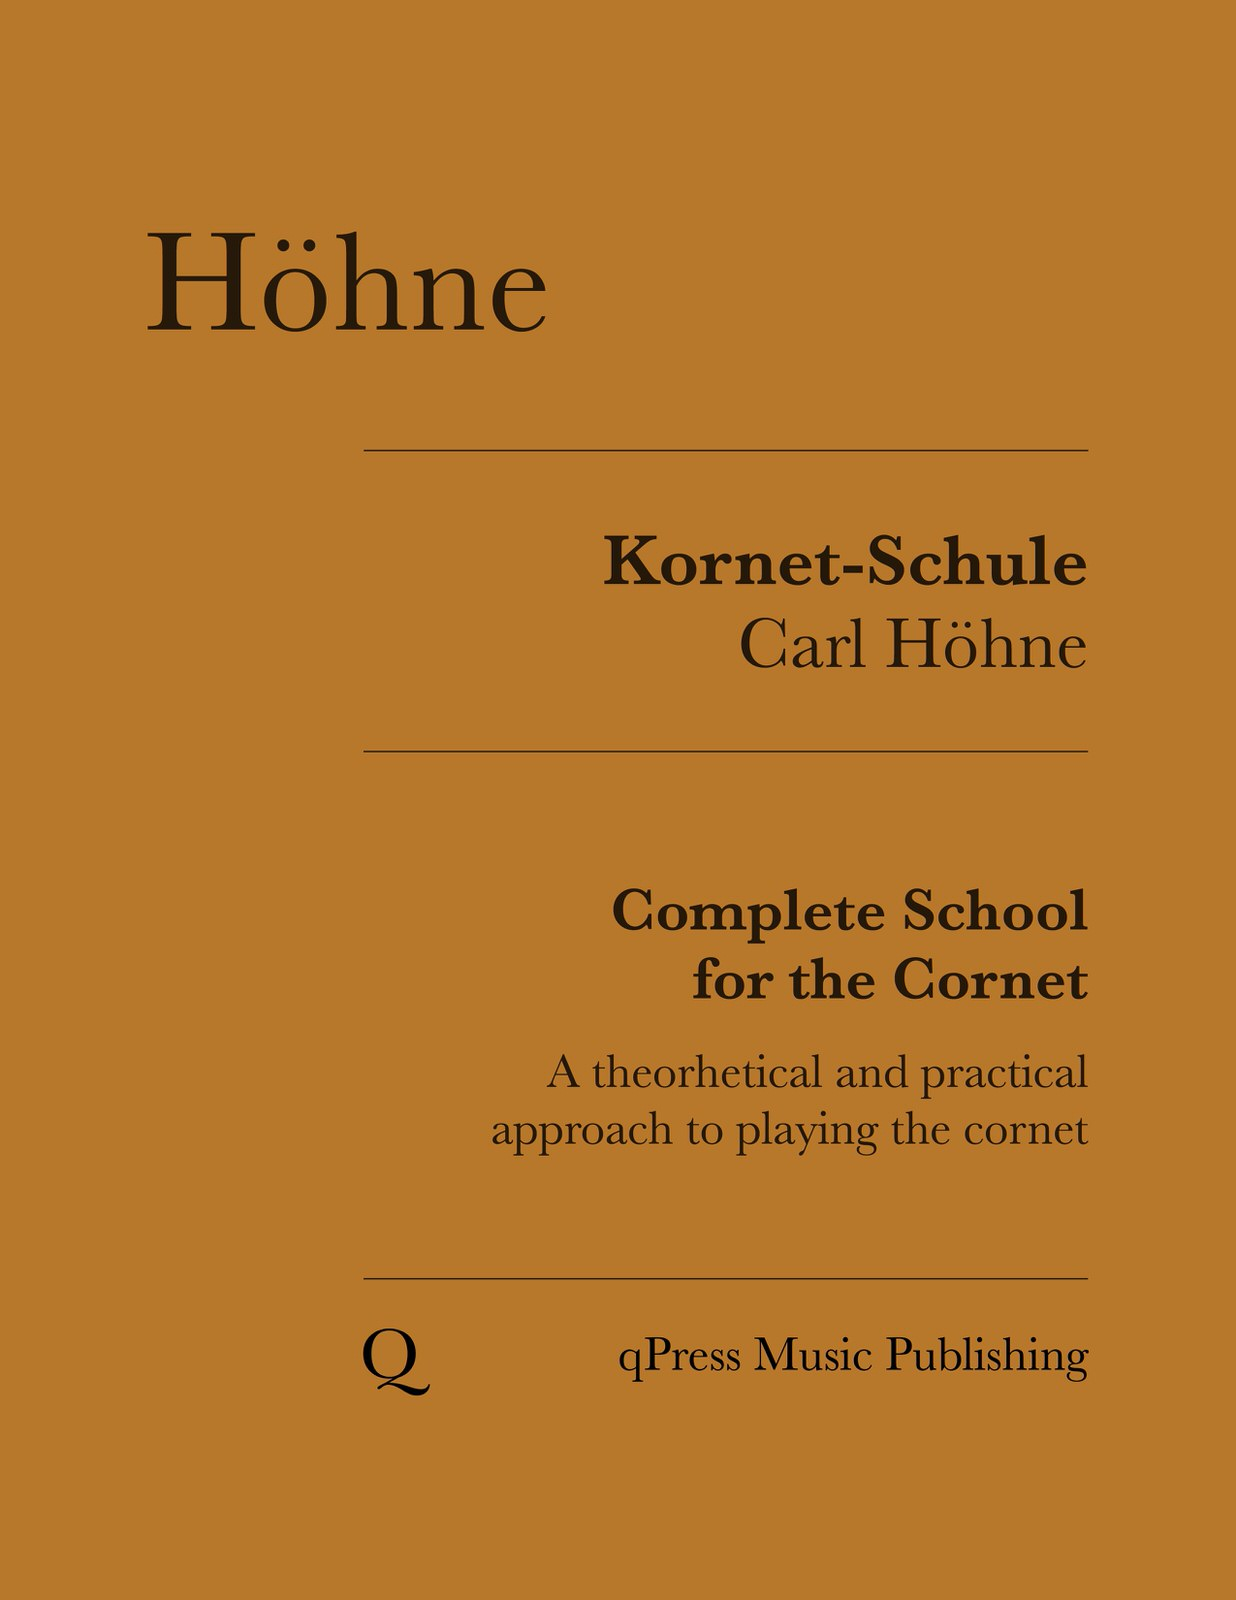 Hohne, Cornet School-p001